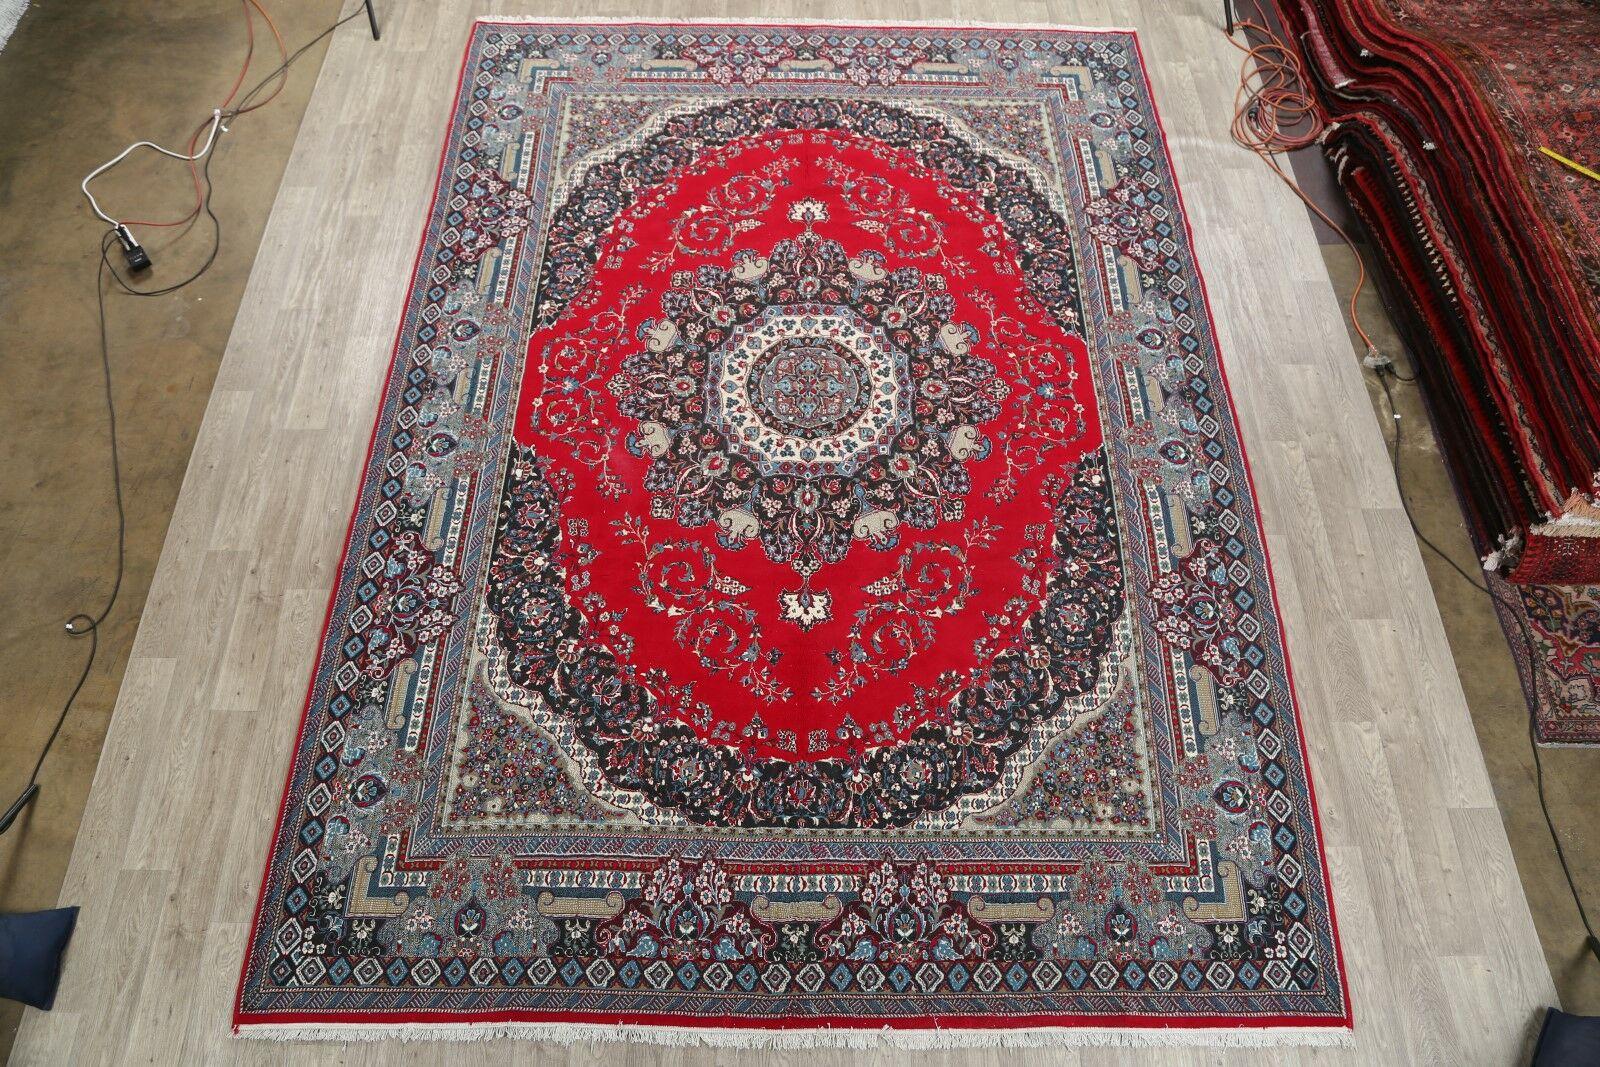 Soft Plush Floral Sarouk Persian Classical Blue/Coral Red/Cream Area Rug